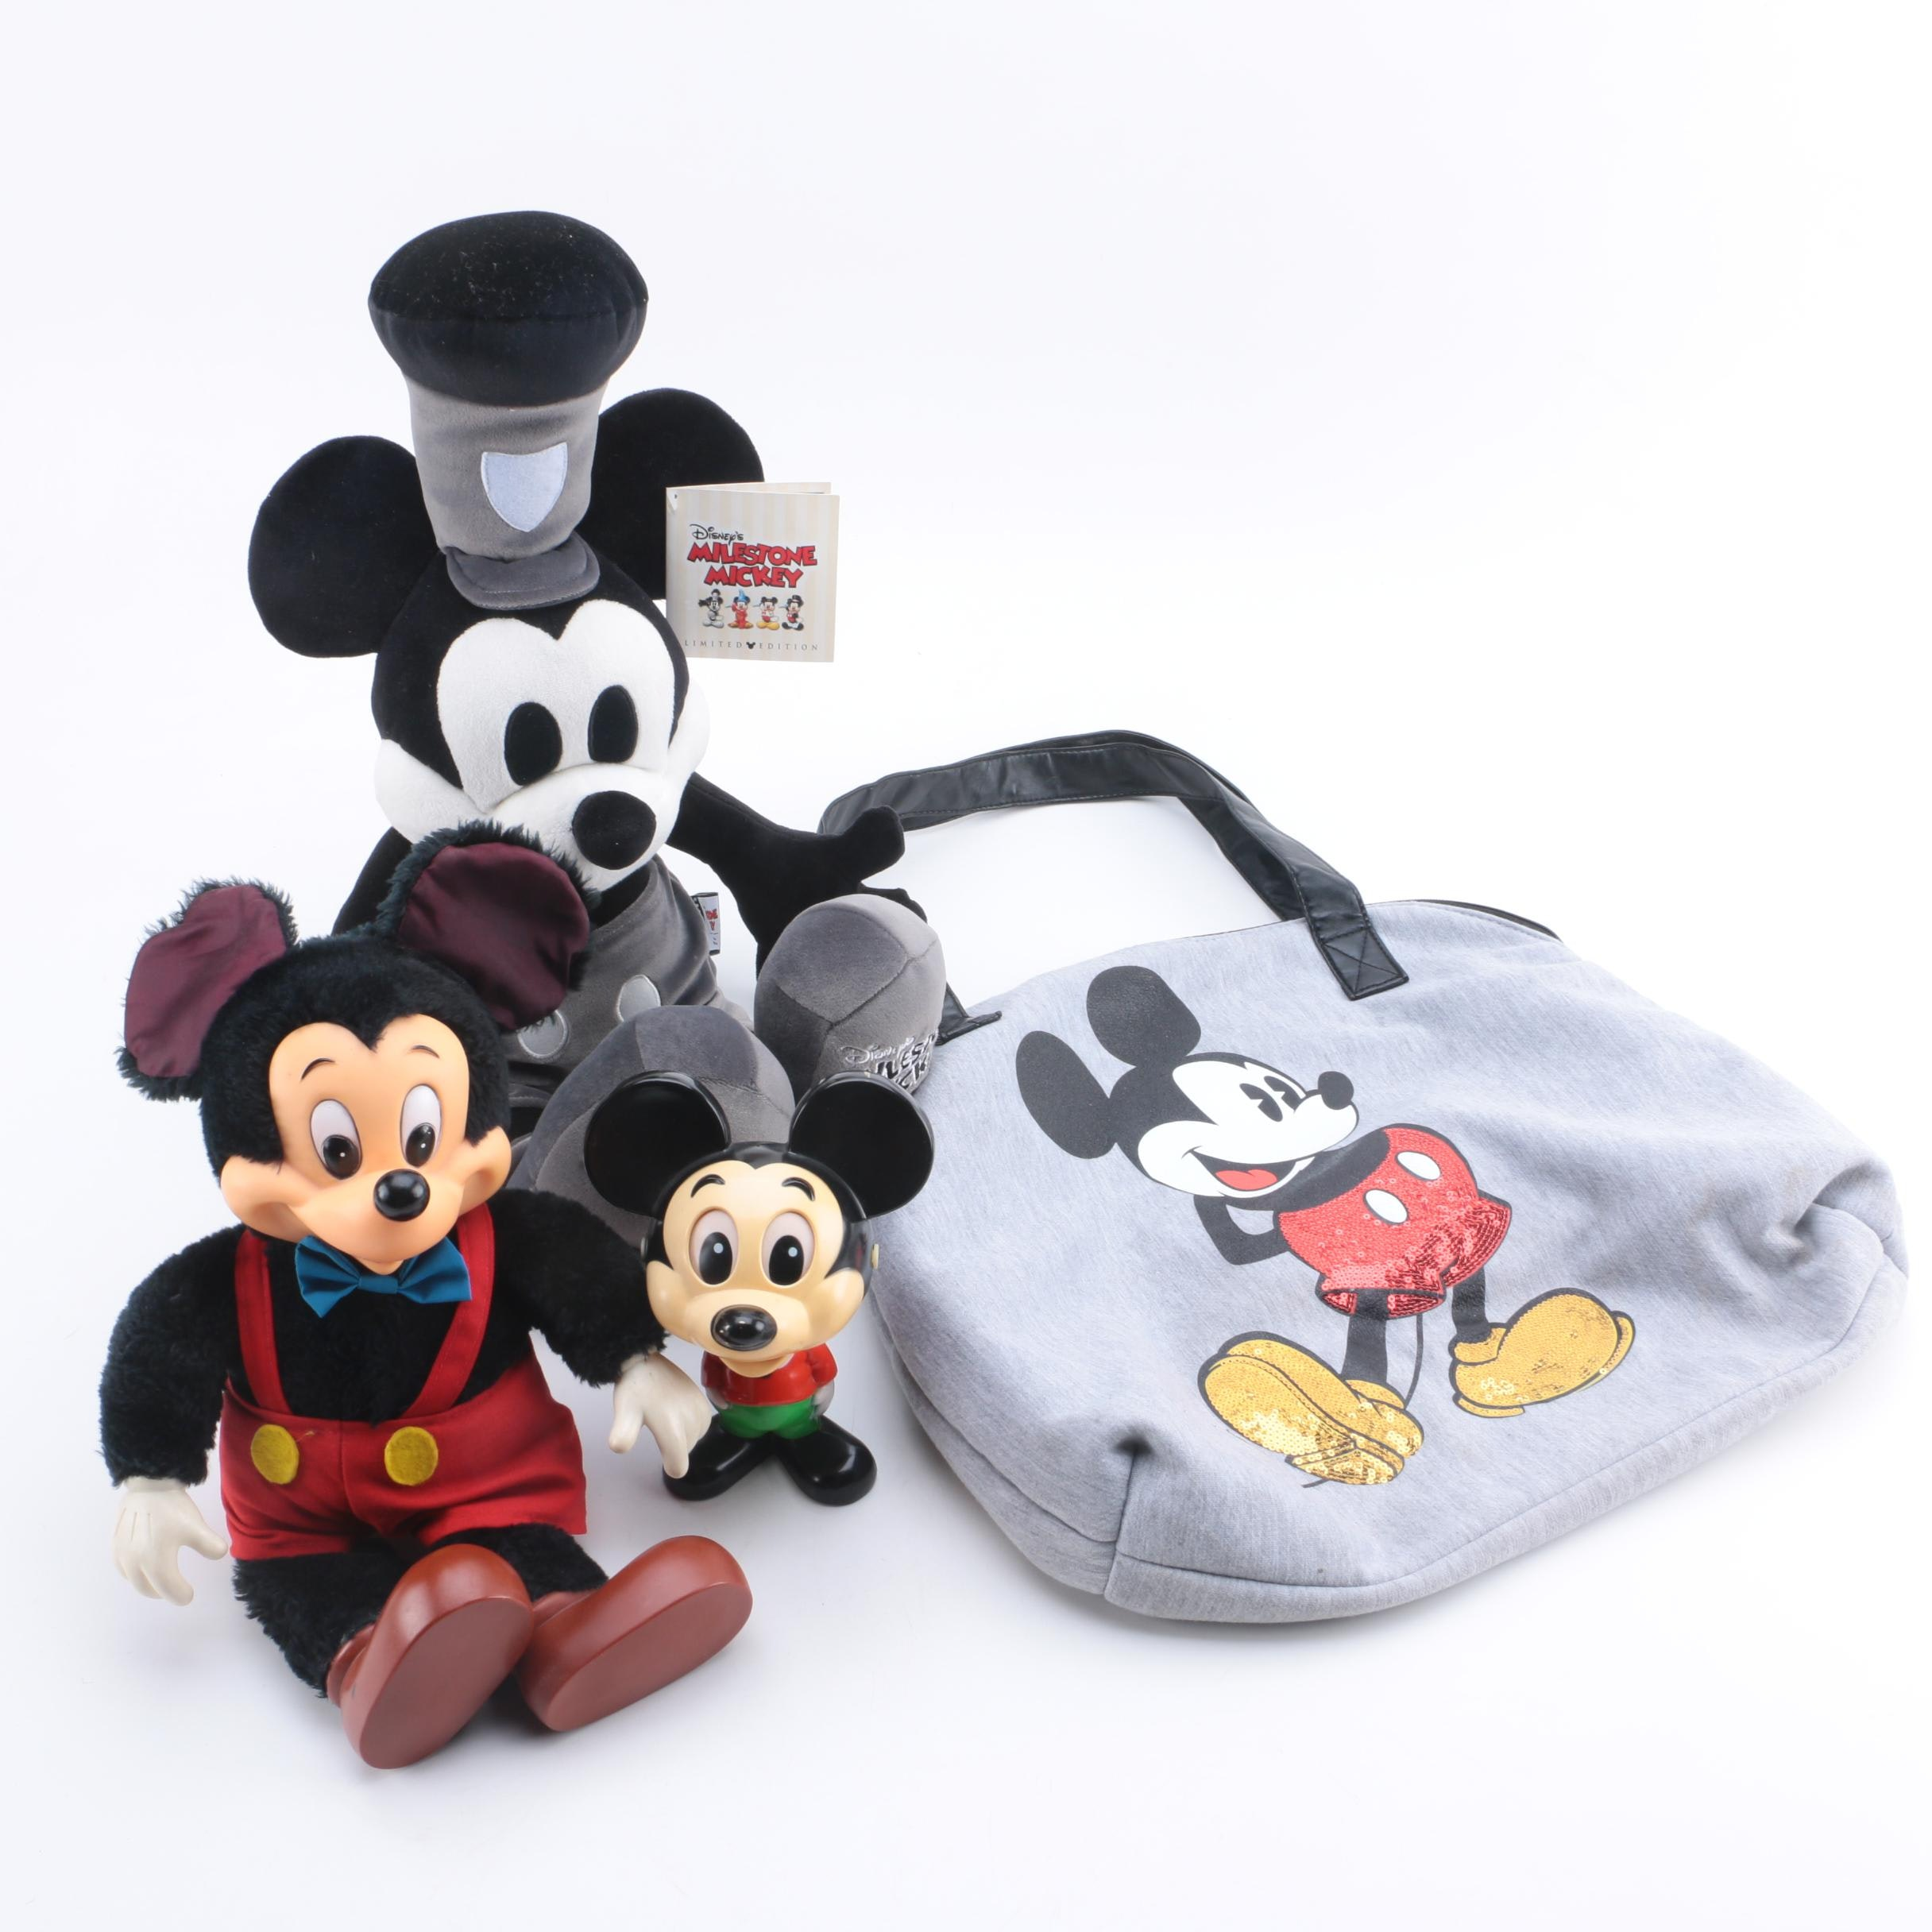 Mickey Mouse Memorabilia Including Cloth Tote Bag